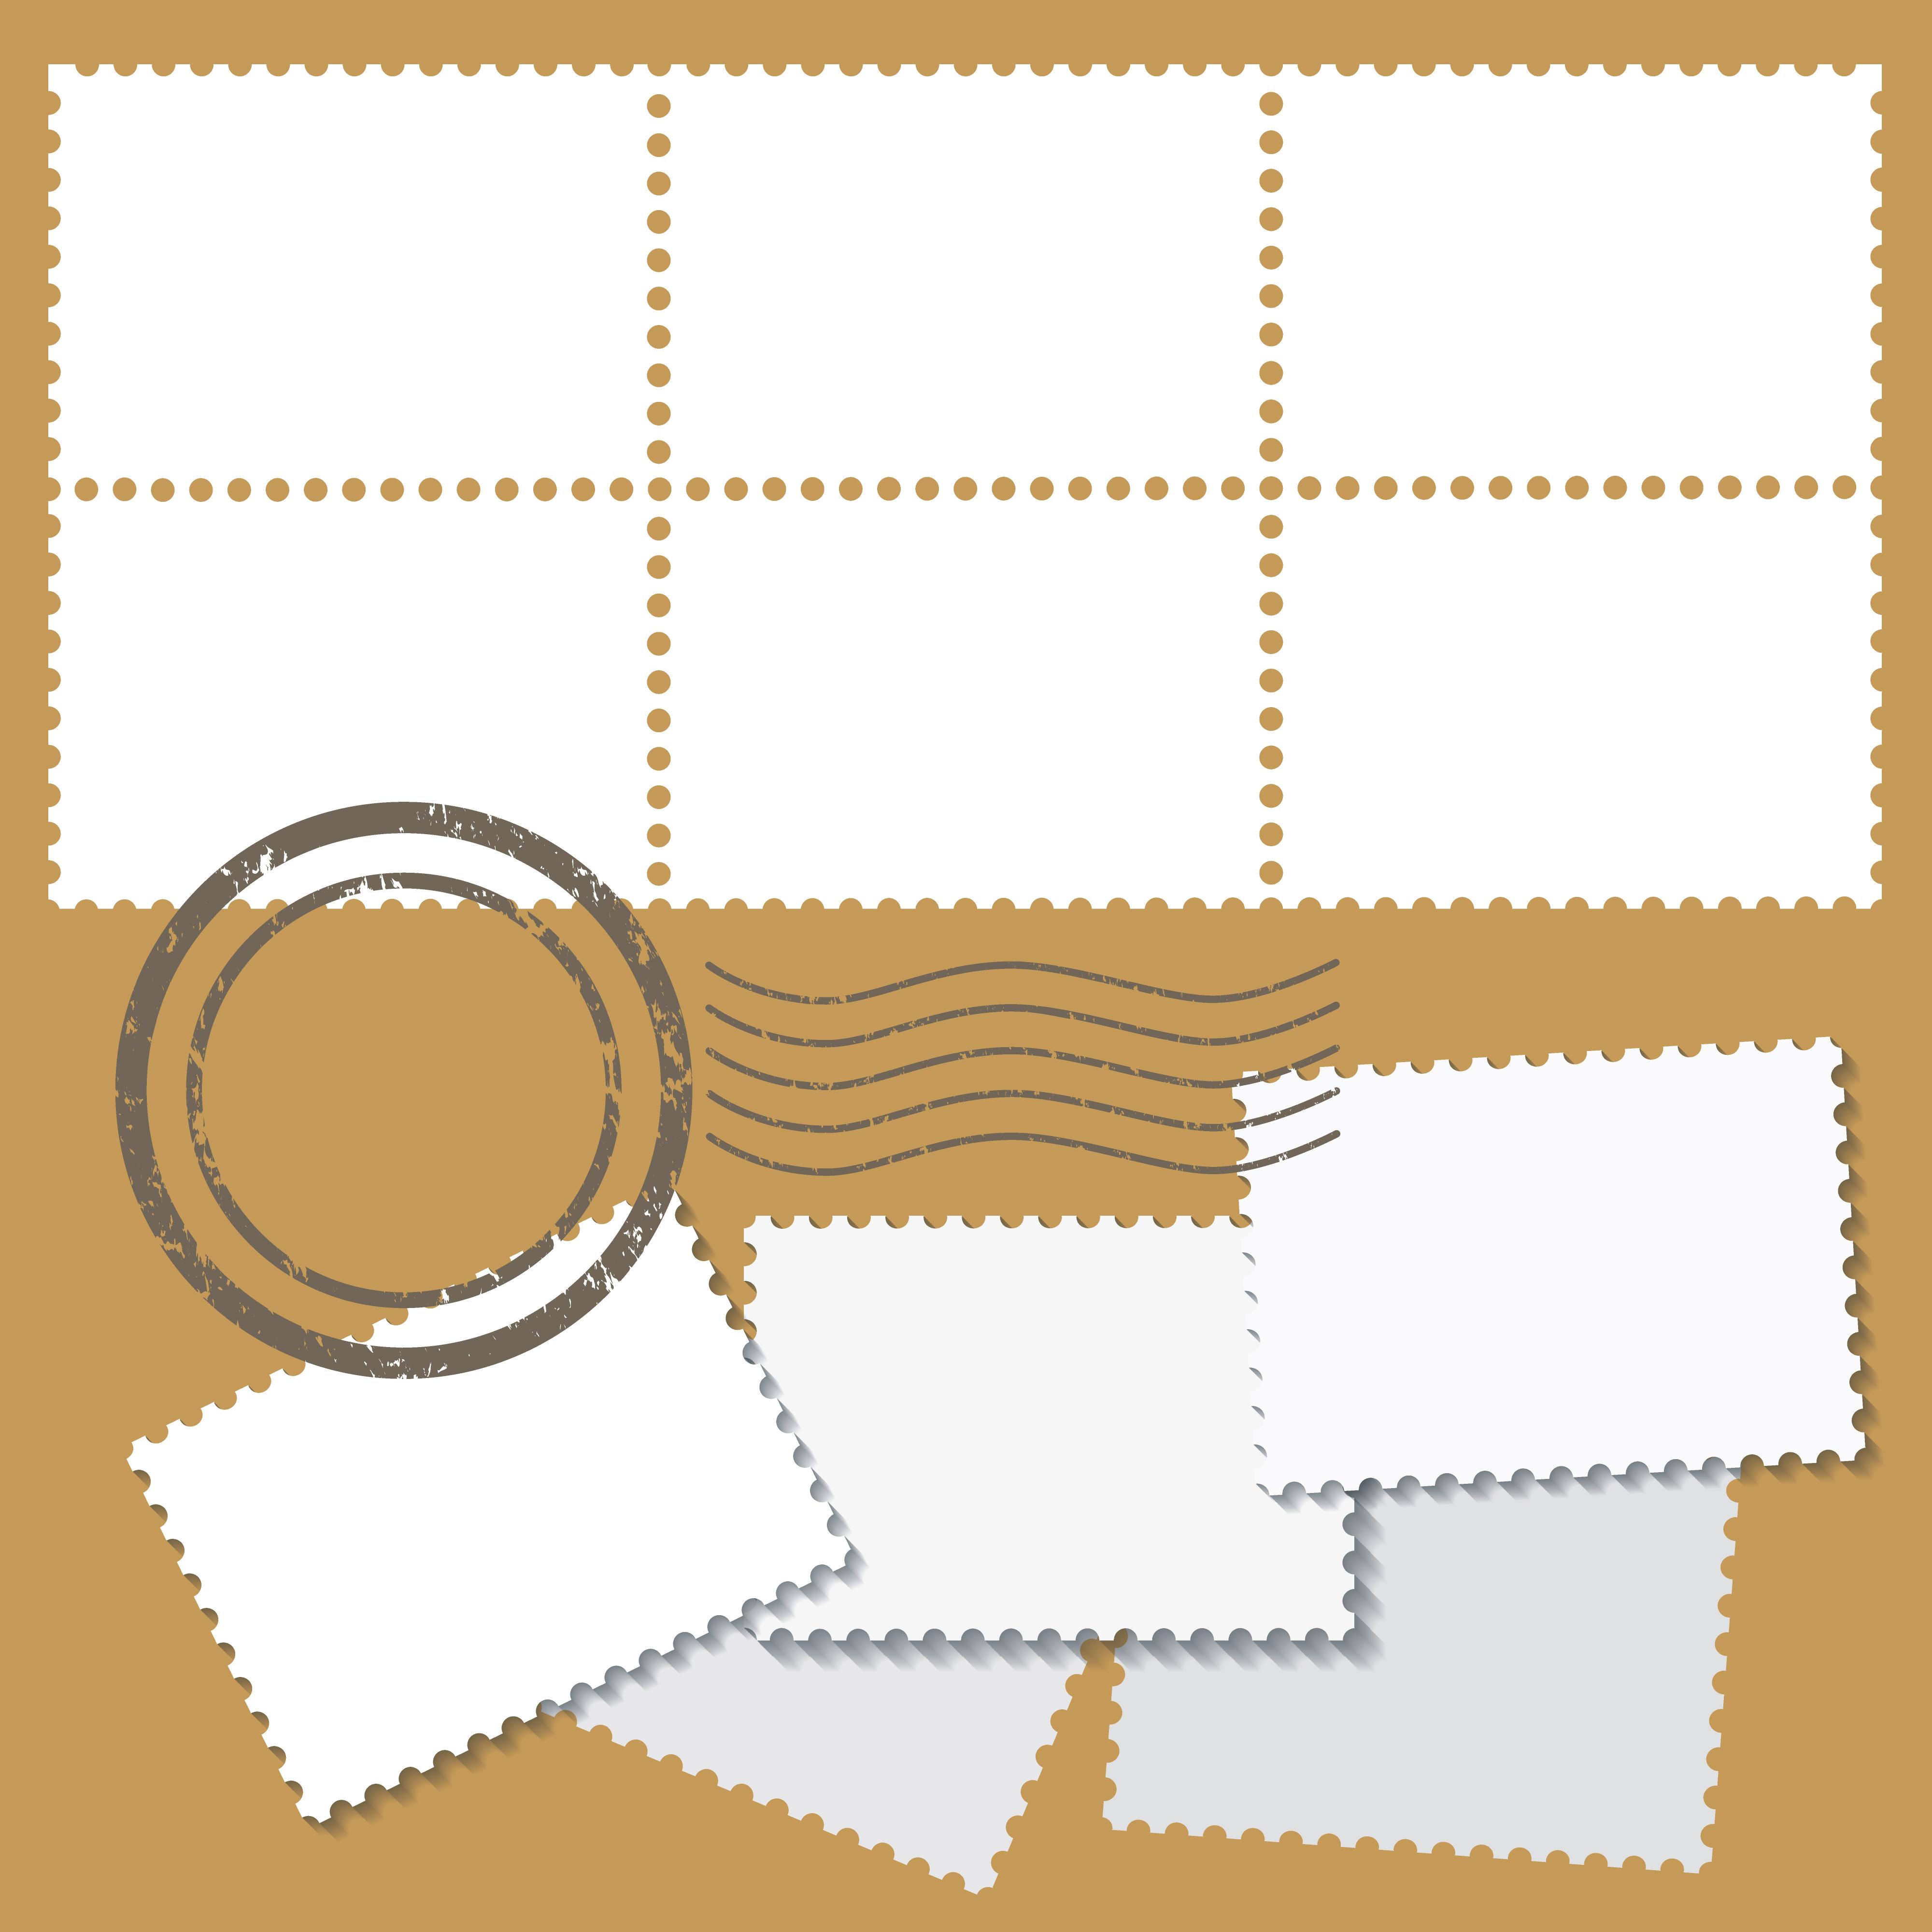 Blank Postage Marks